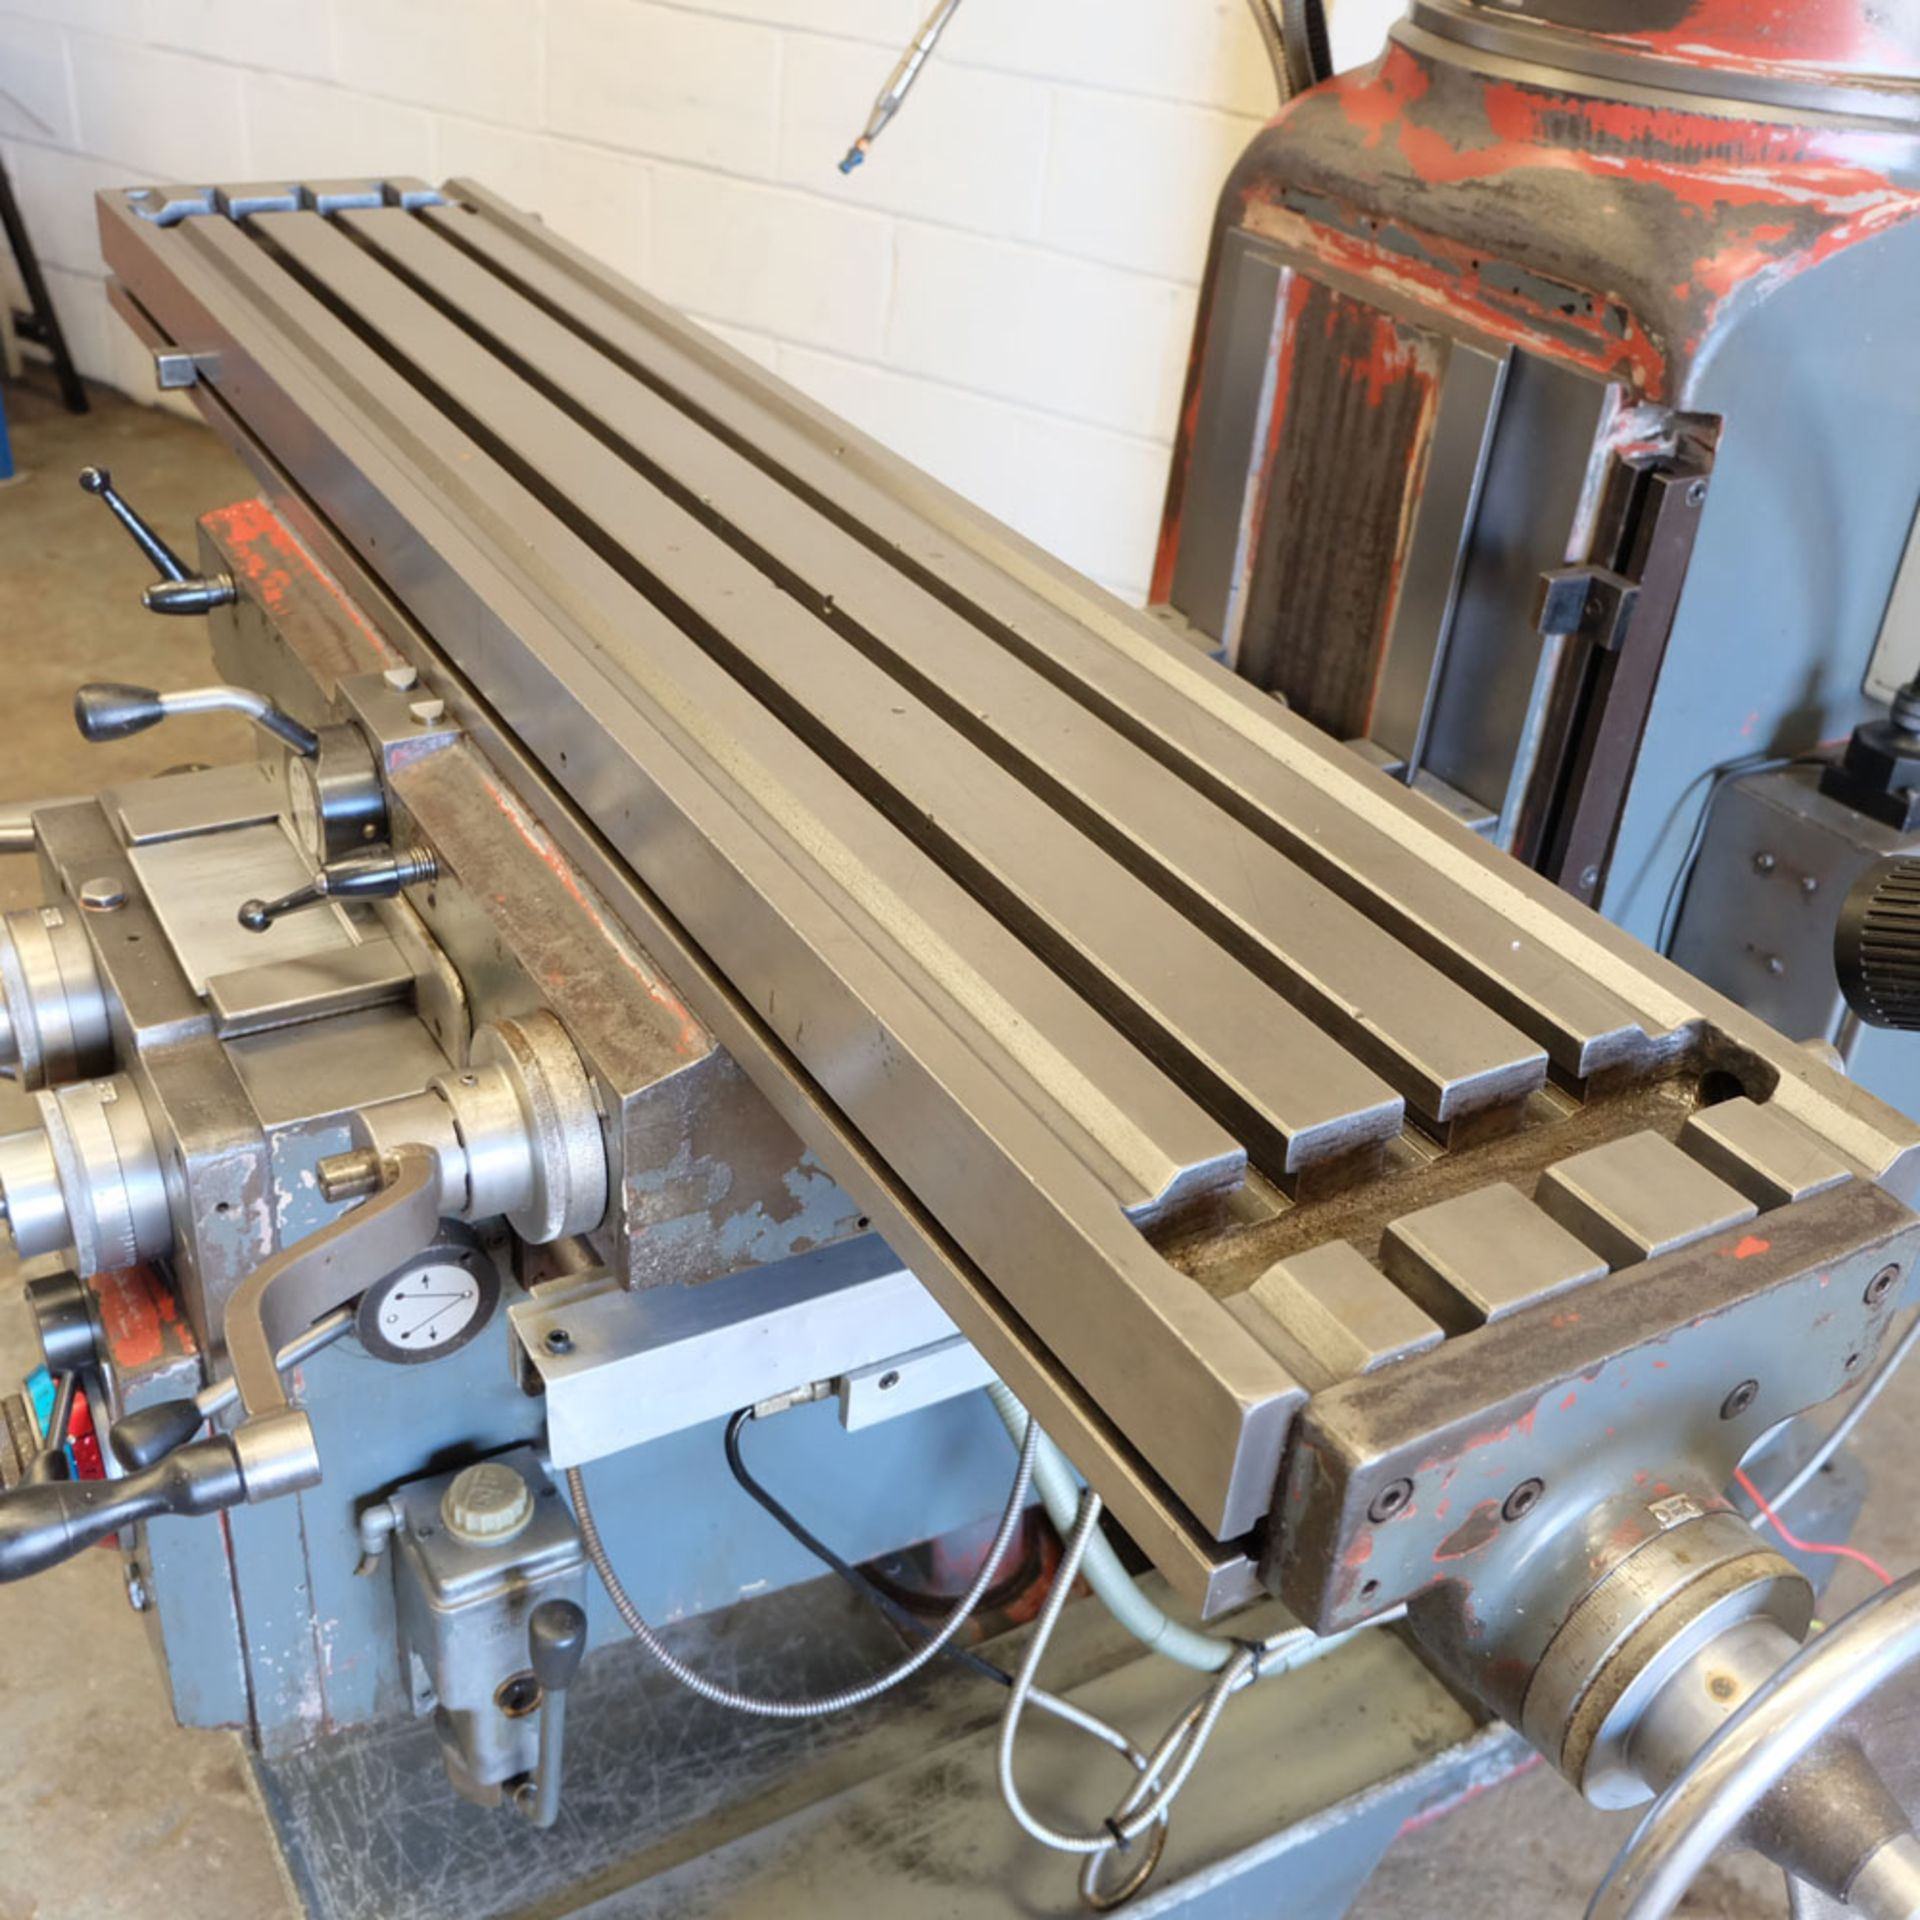 AJAX Model AJT.4 Turret Milling Machine. Table Size: 1372 x 280mm. - Image 2 of 8